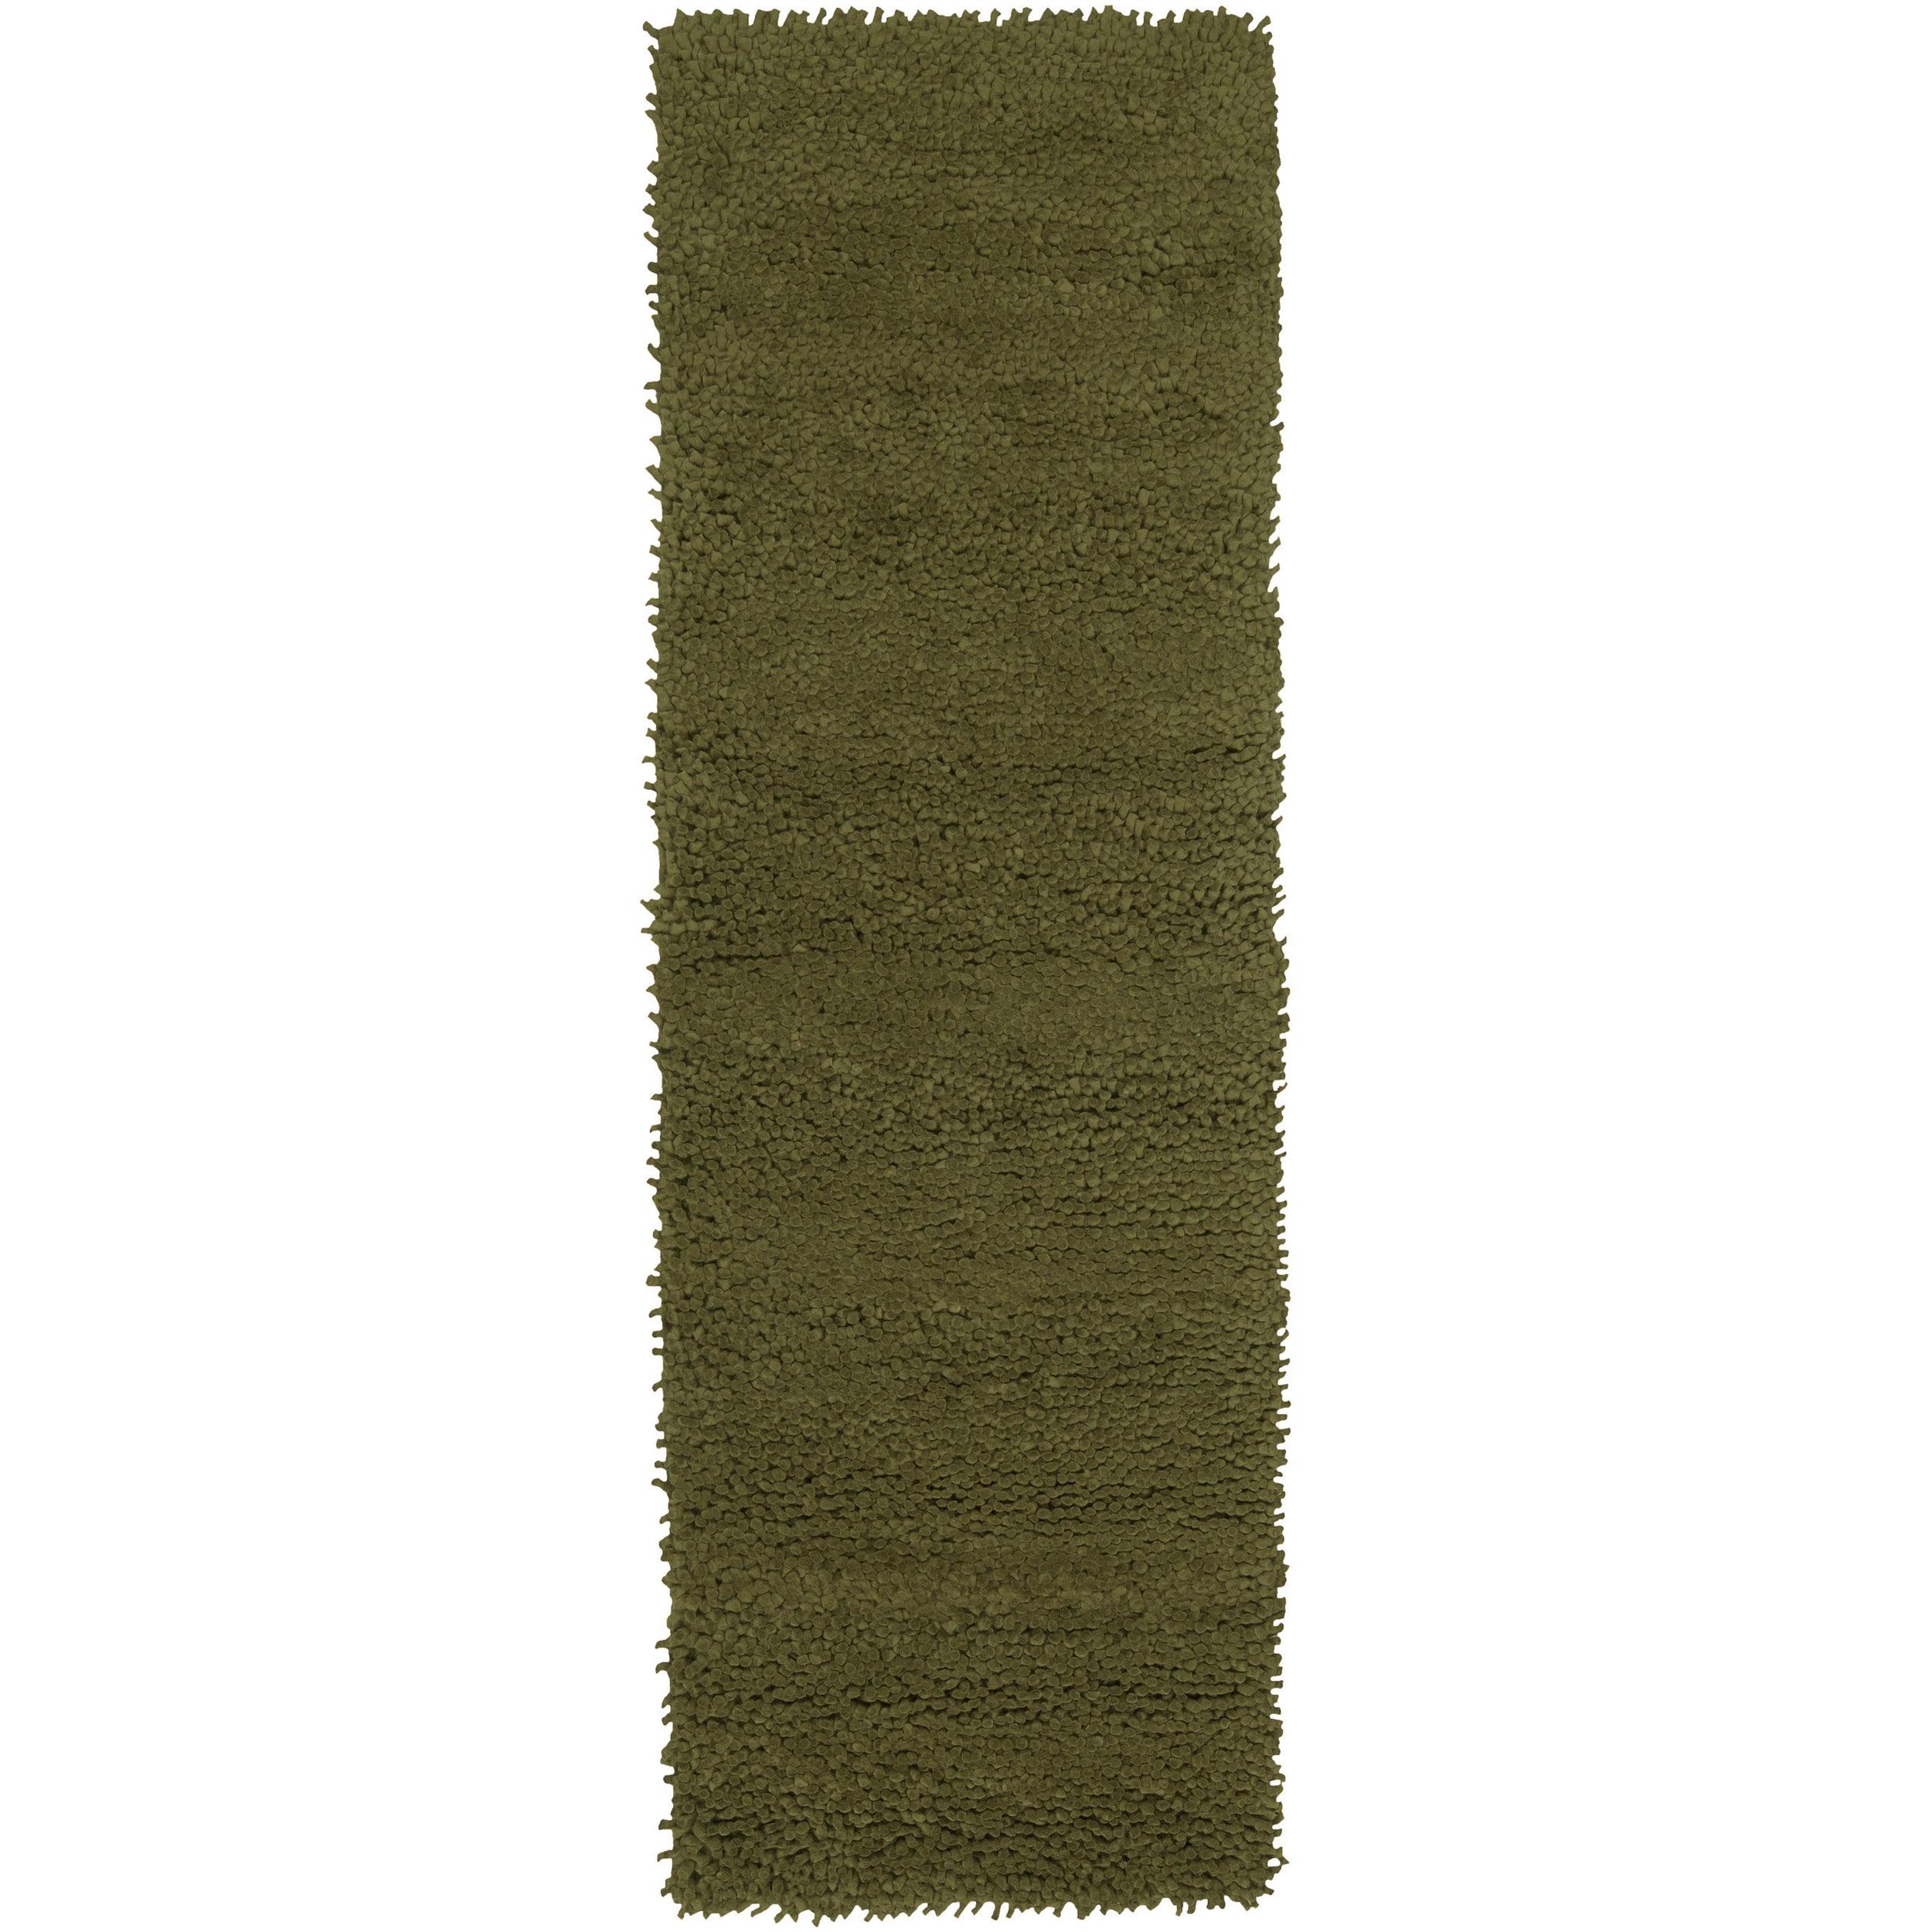 Hand-woven Green Boegli Colorful Plush Shag New Zealand Felted Wool Rug (2'6 x 8')